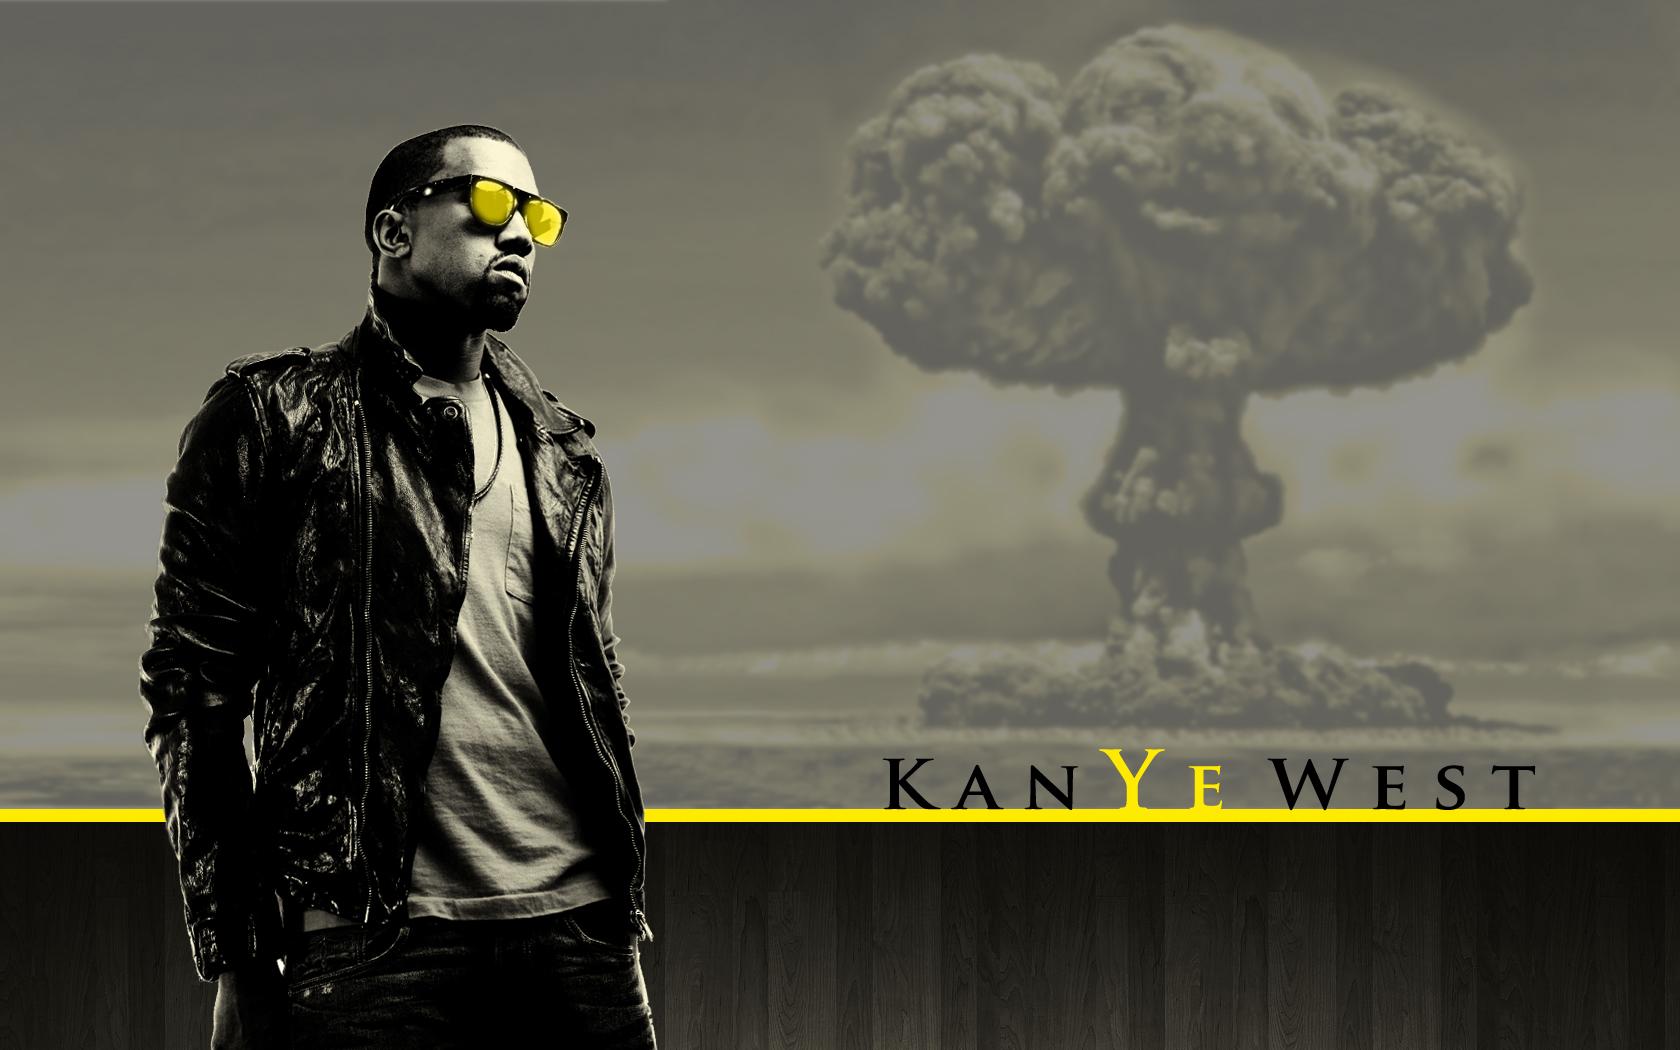 Kanye West HD Wallpaper Power (70+ images) Kanye West Power Wallpaper Hd